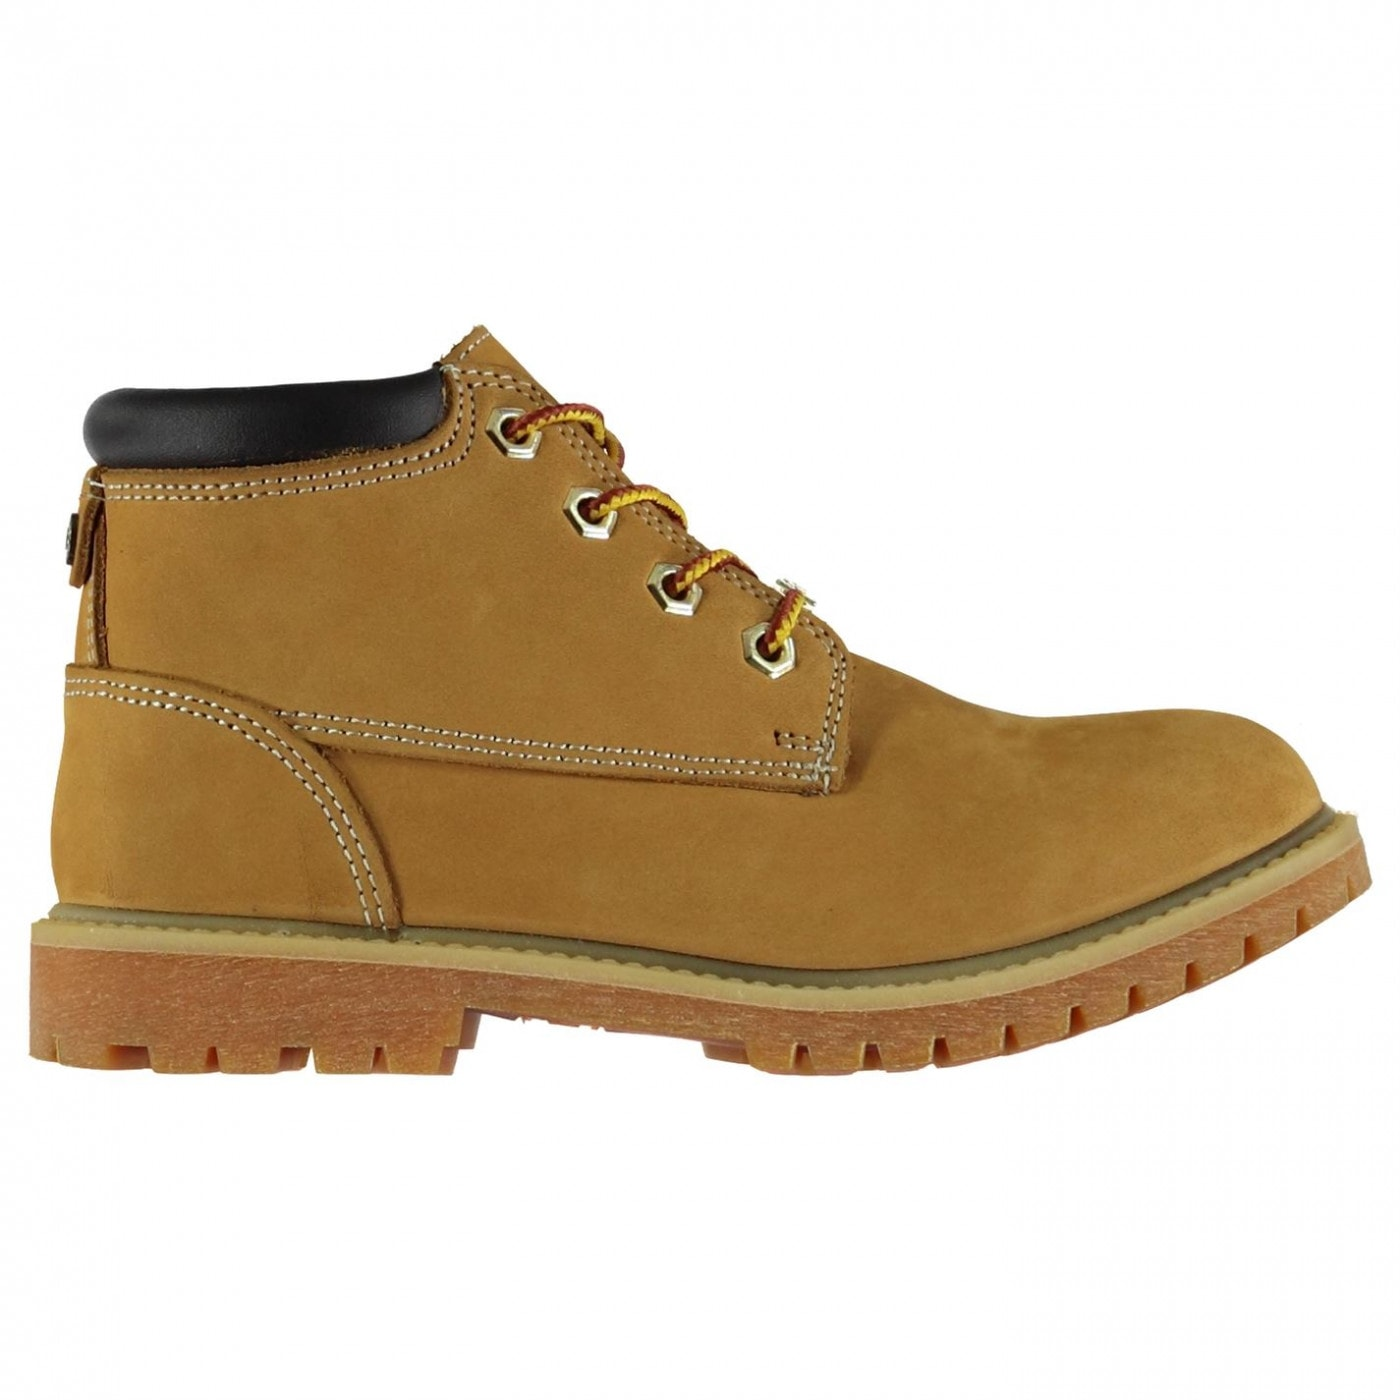 Firetrap Merlin Boots